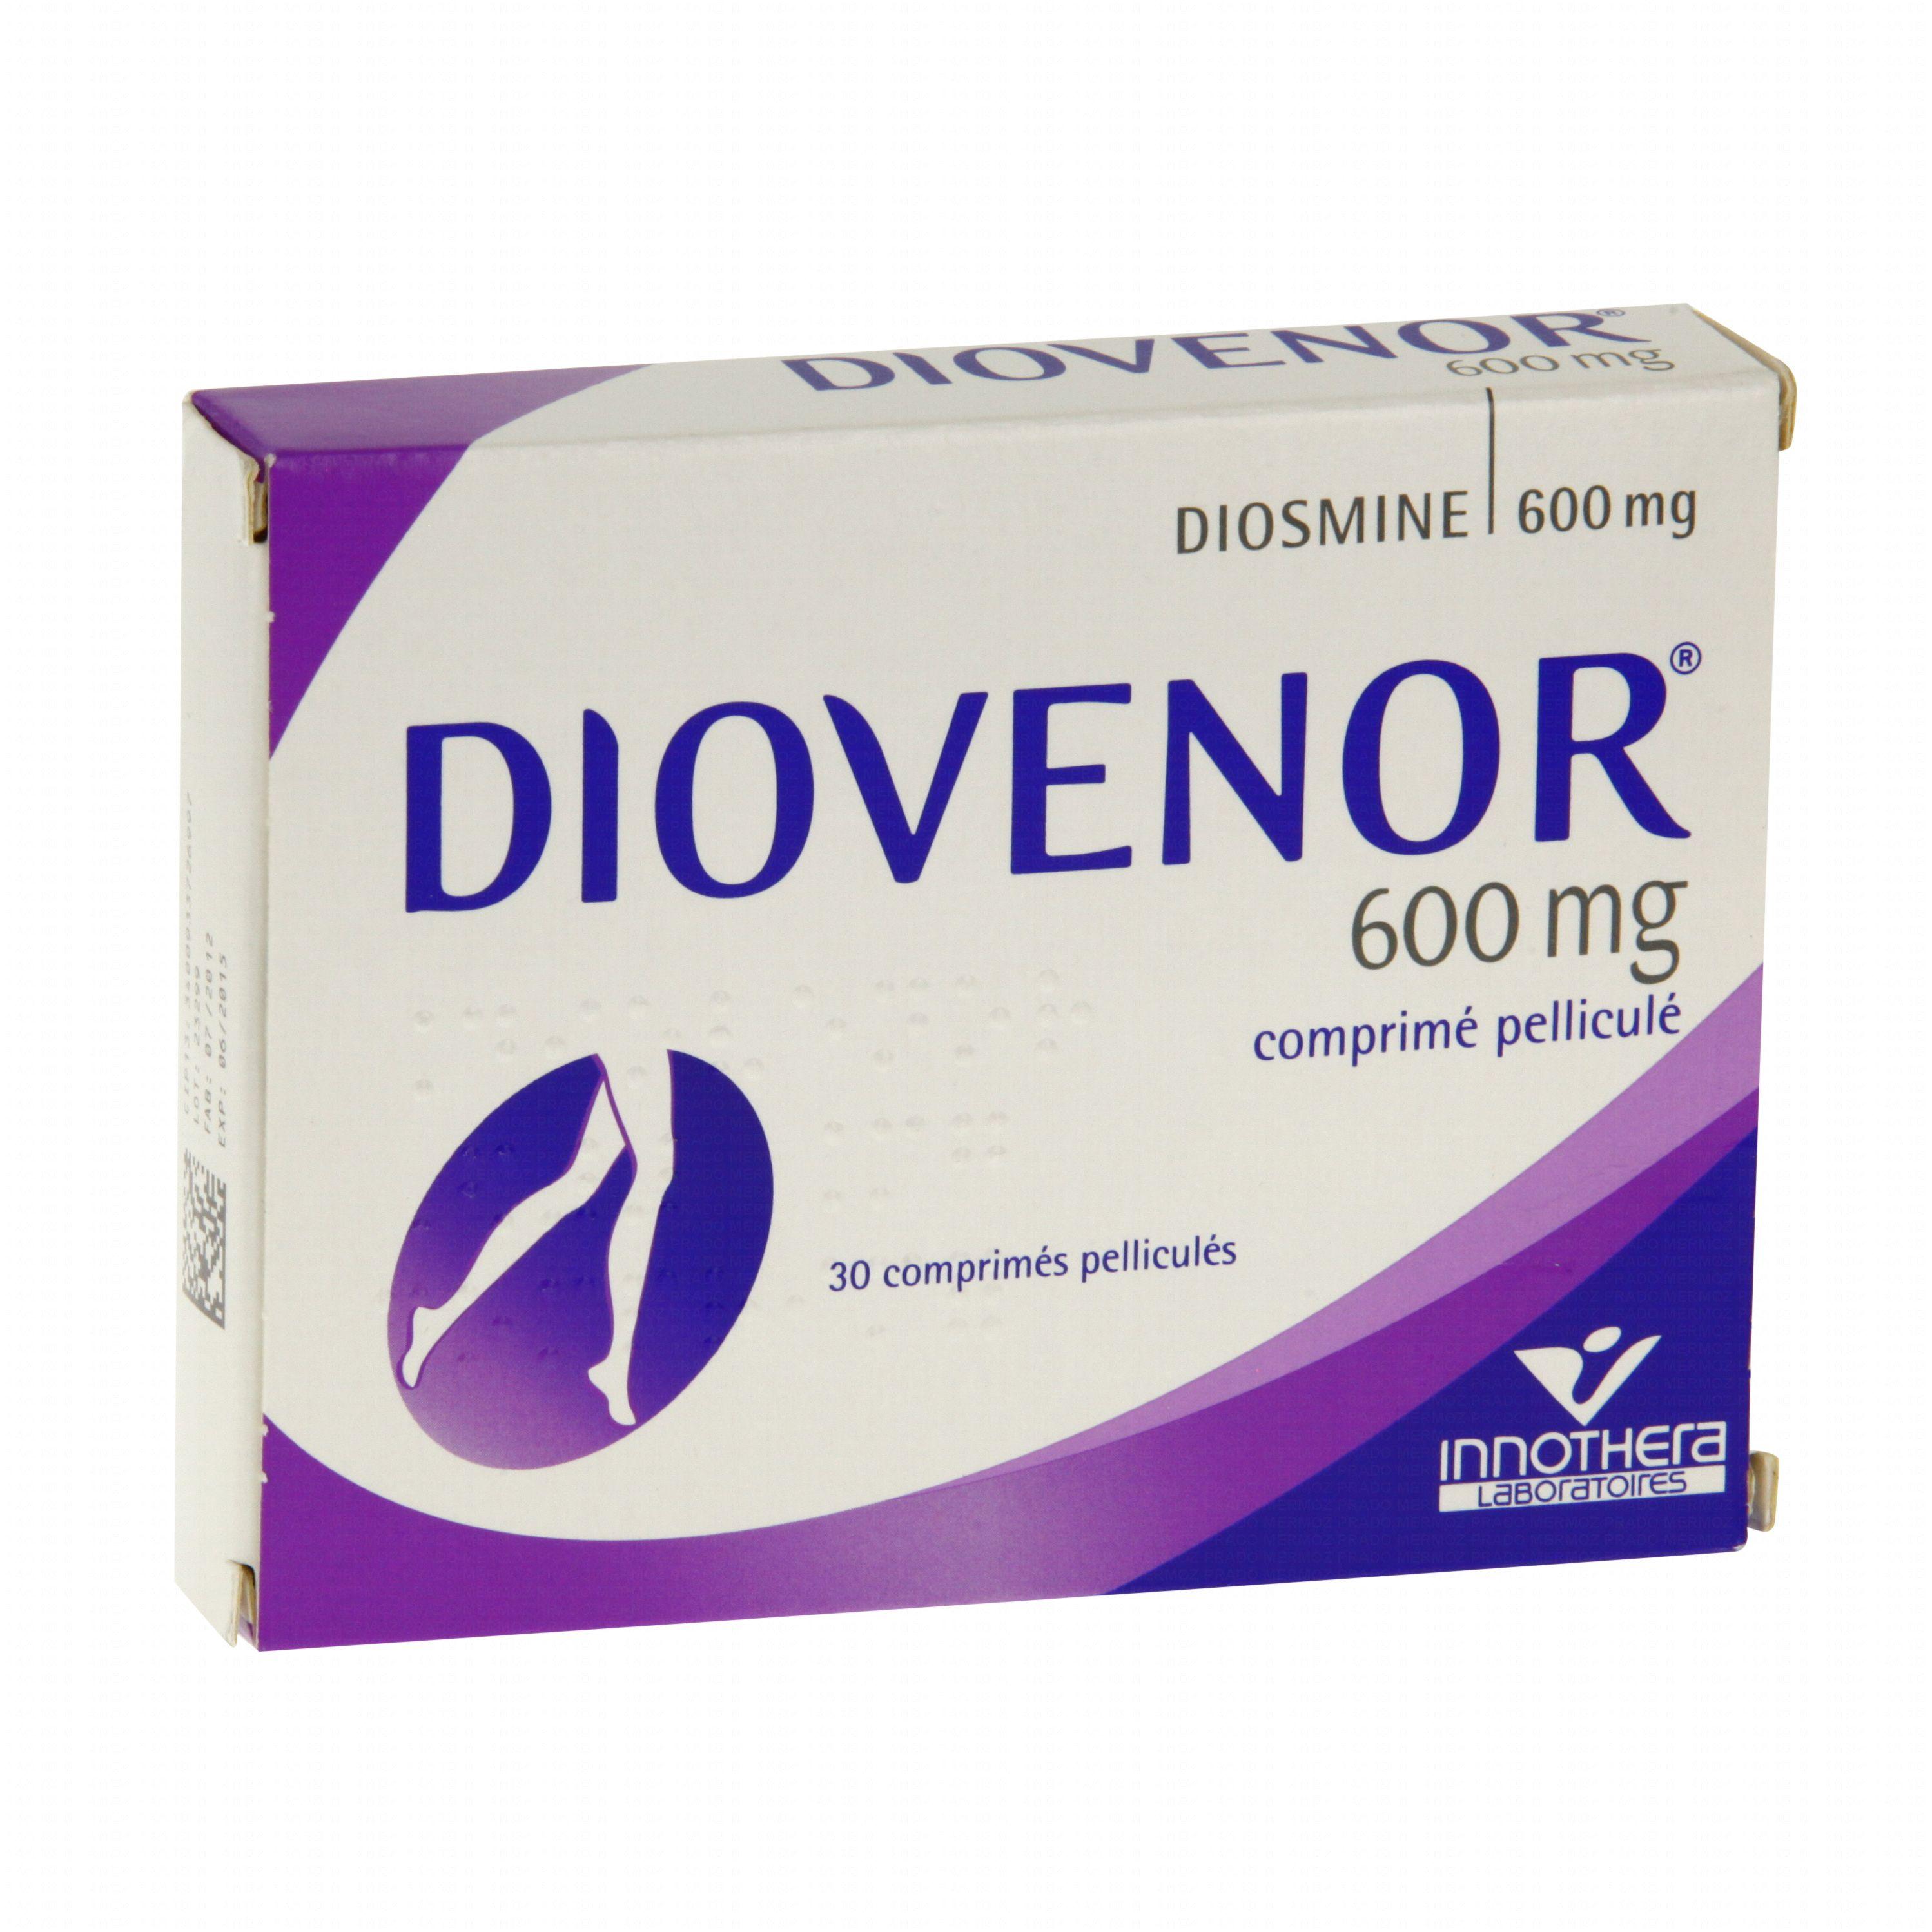 Clindamycin 450 mg beipackzettel ciprofloxacin